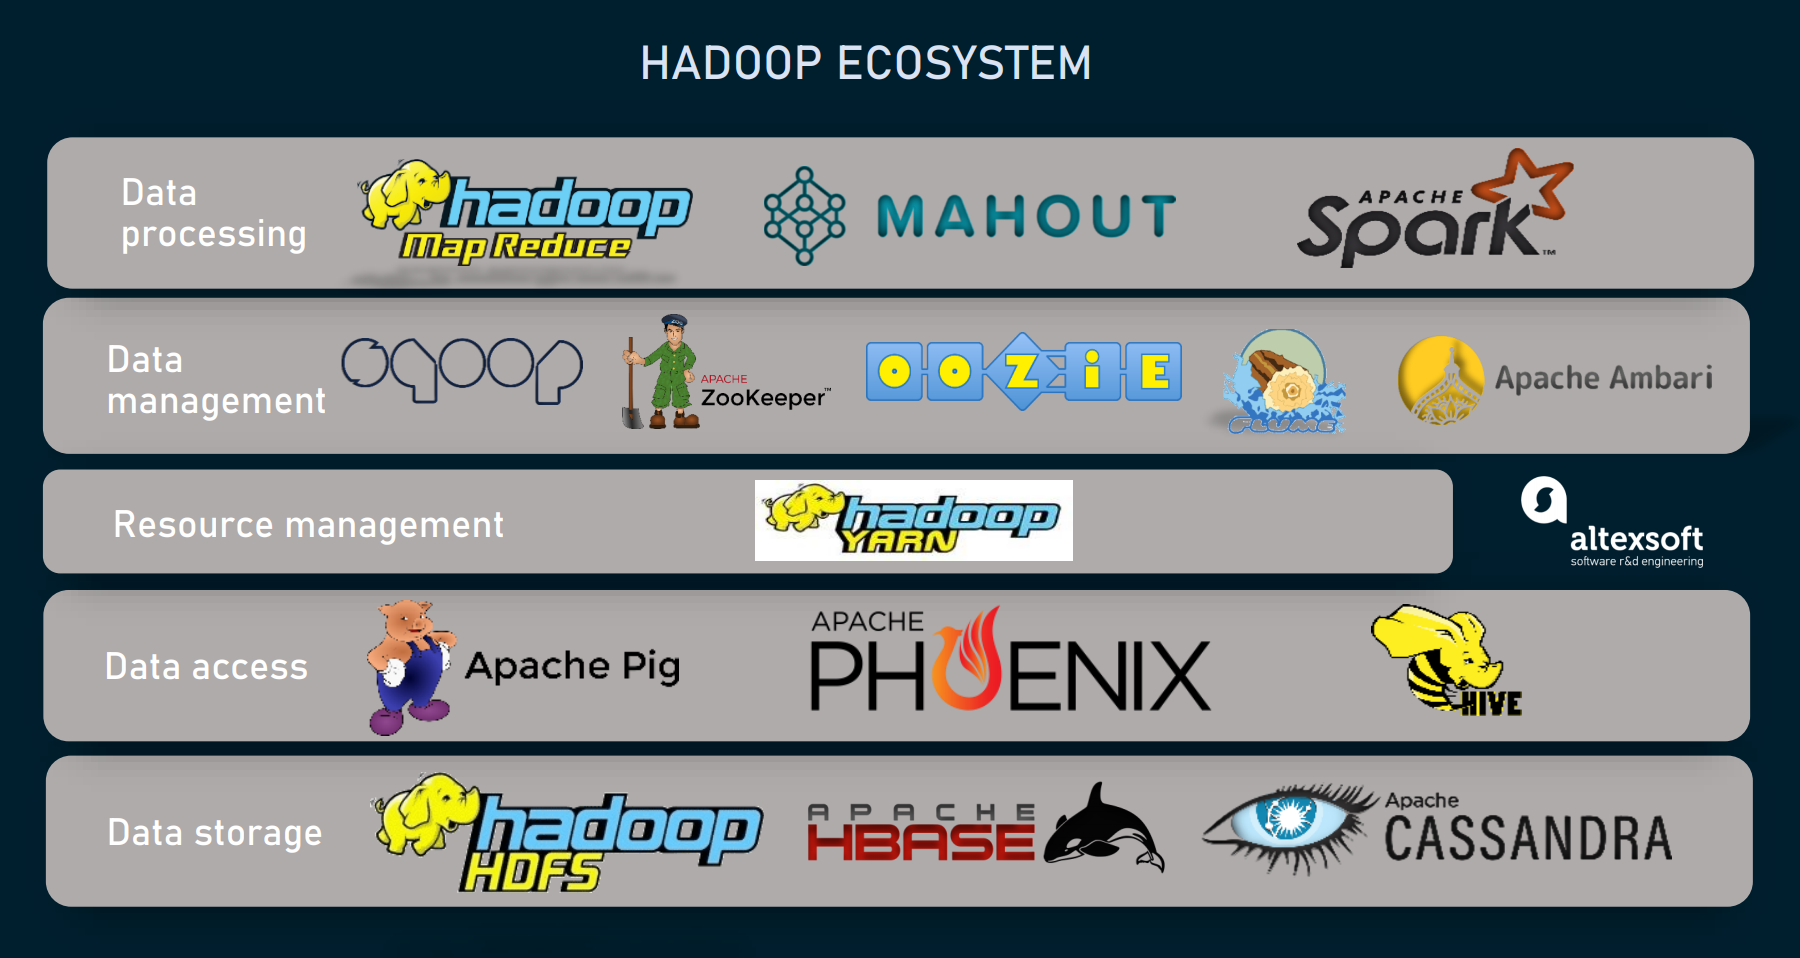 Hadoop ecosystem solutions